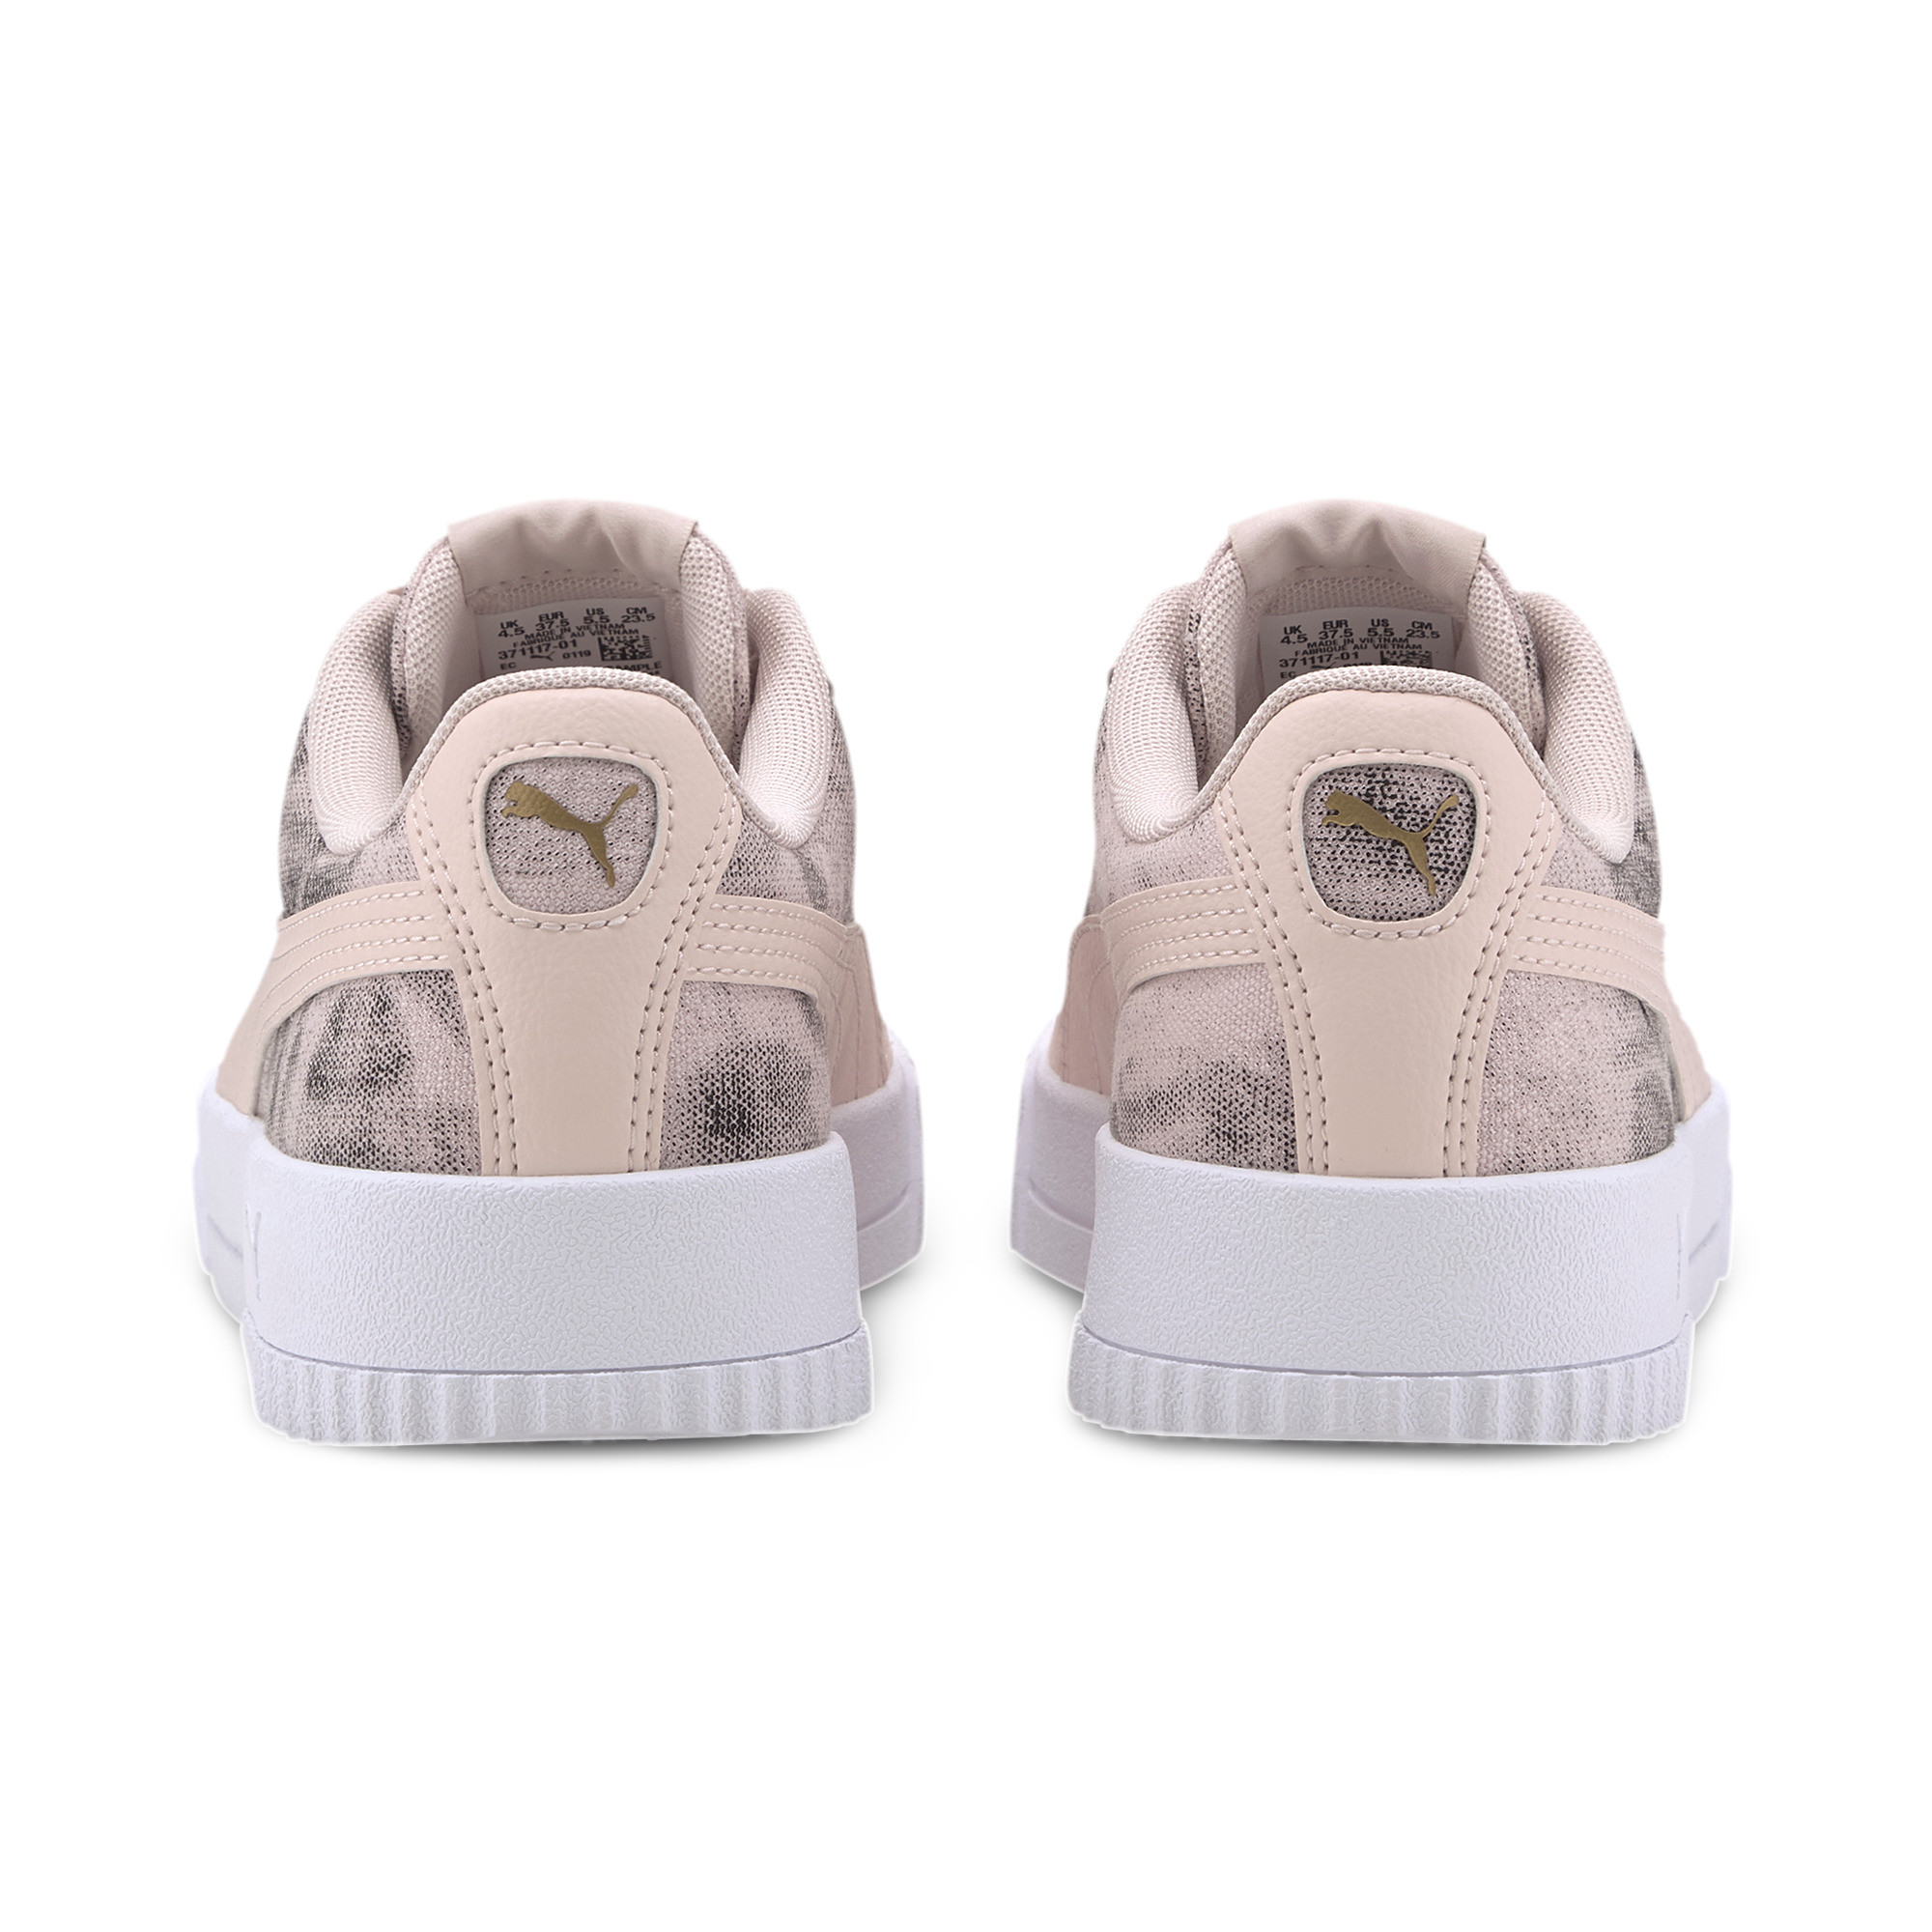 PUMA-Women-039-s-Carina-Tie-Dye-Sneakers thumbnail 3